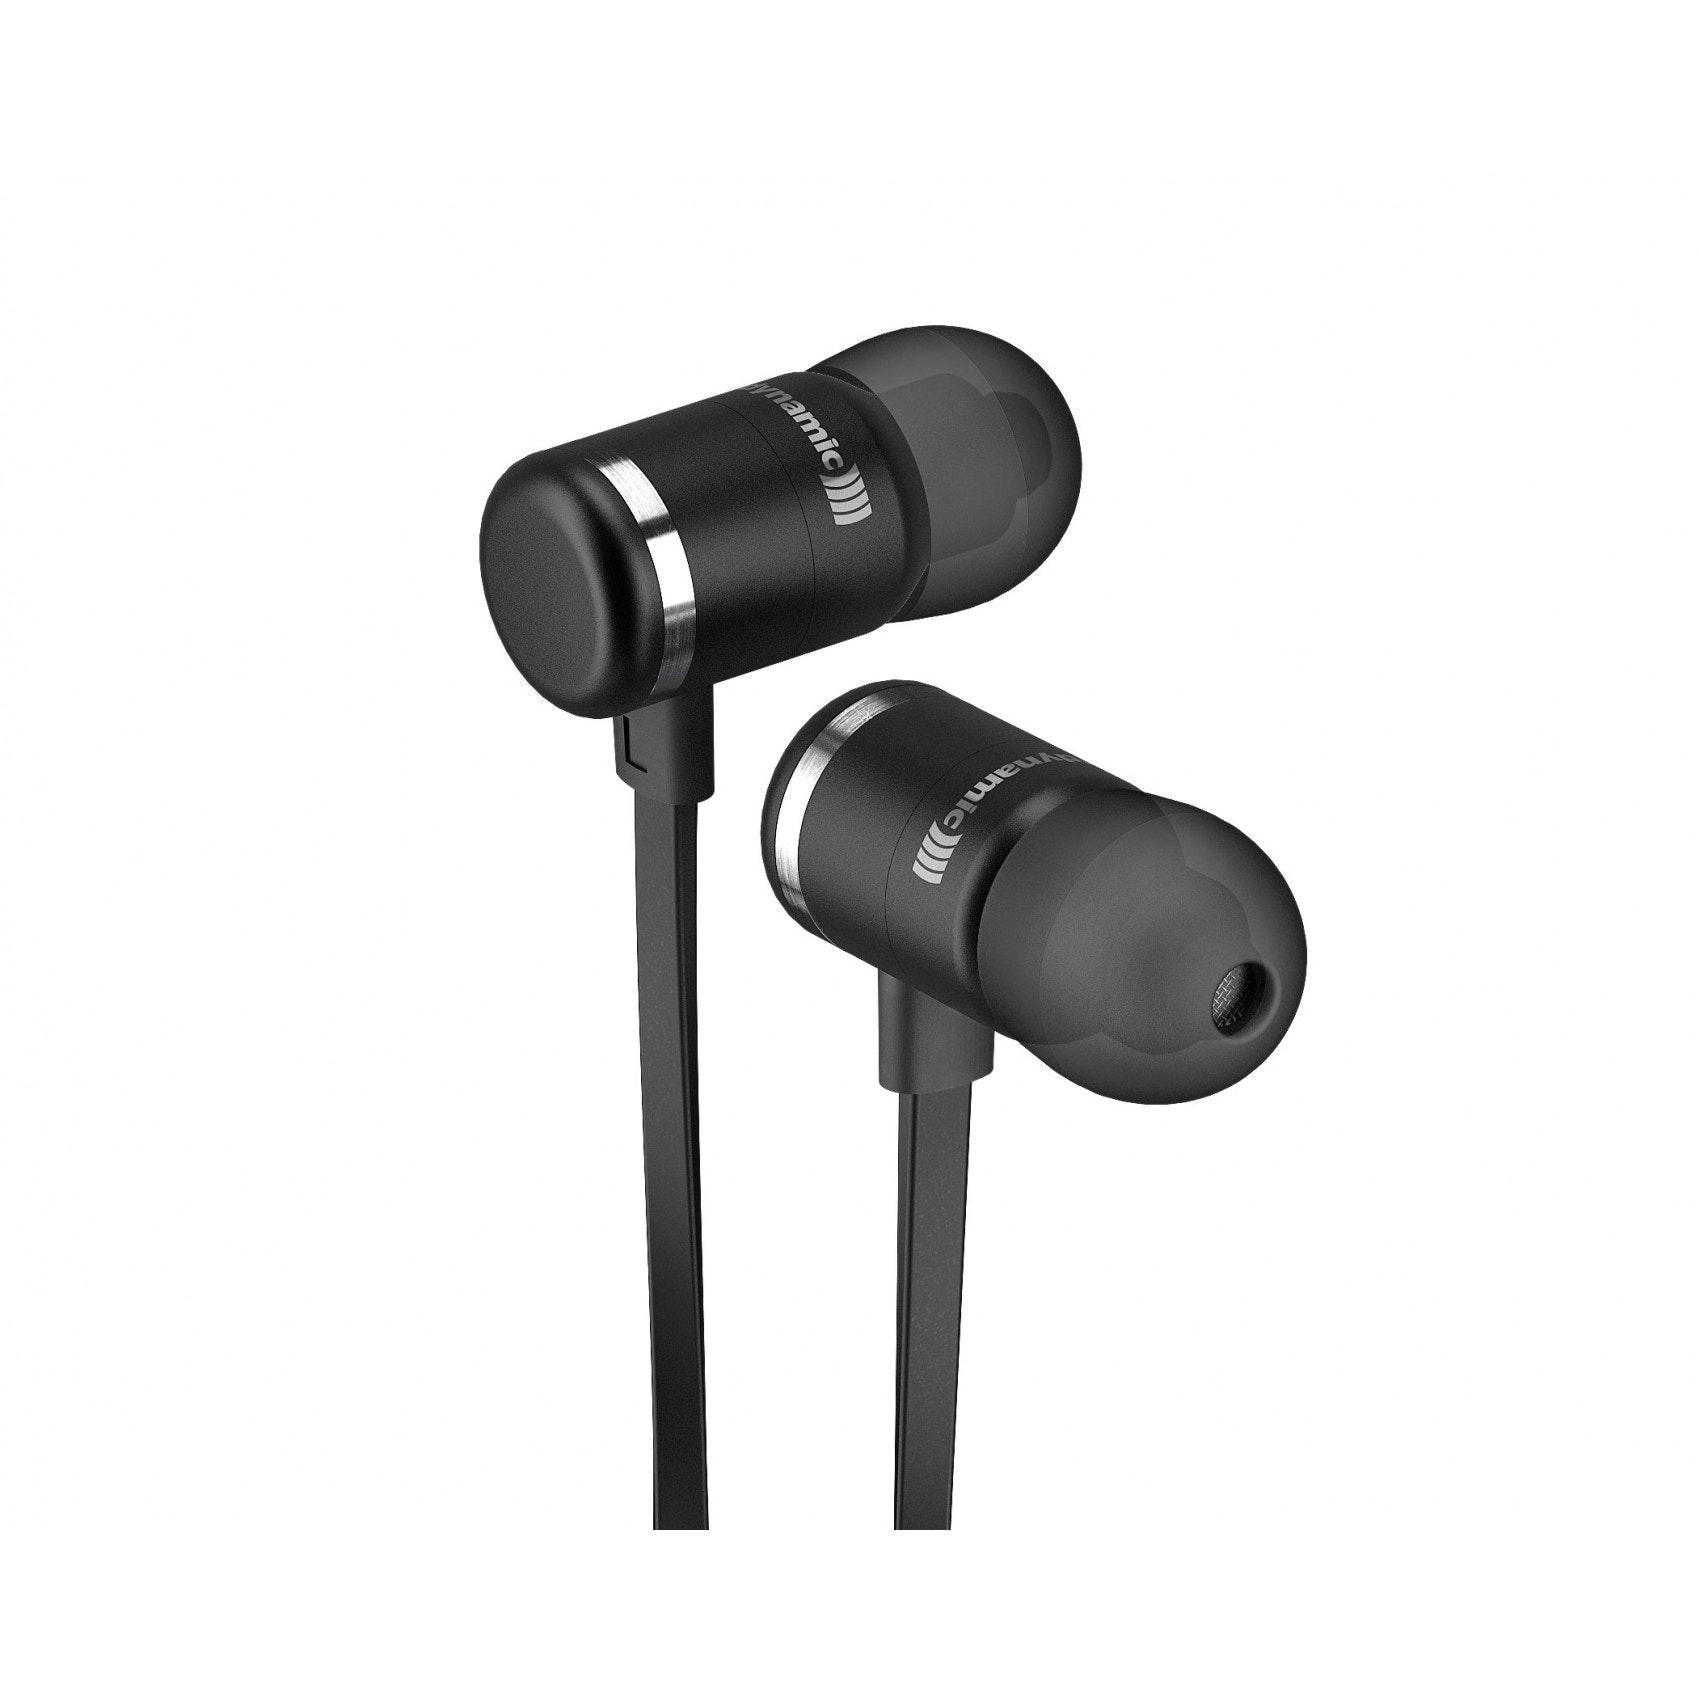 beyerdynamic Byron BTA wireless: Premium Bluetooth In-Ear headphones/headset